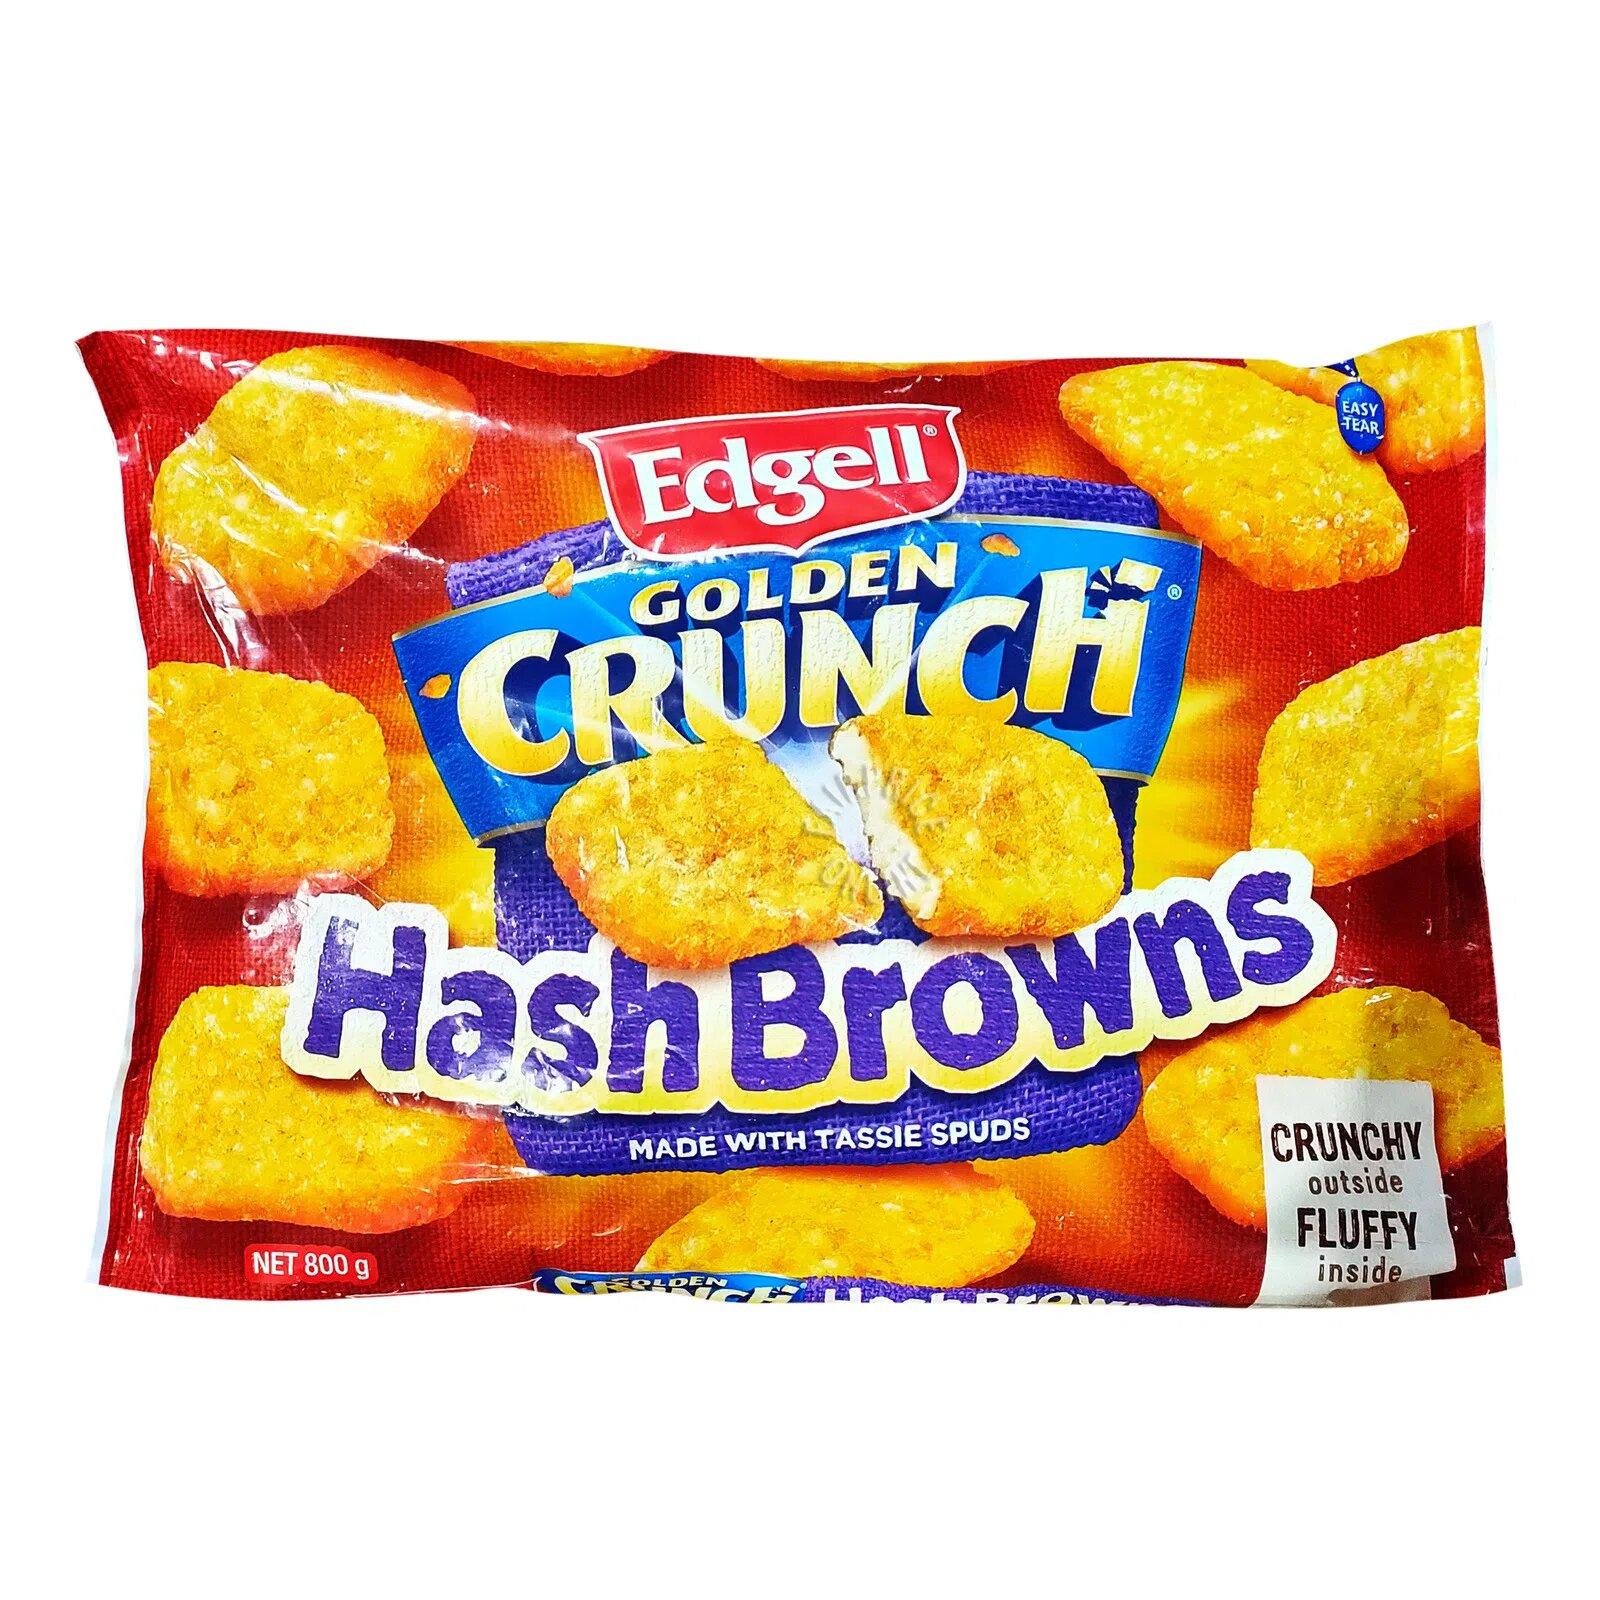 Edgell Golden Crunch Hash Browns